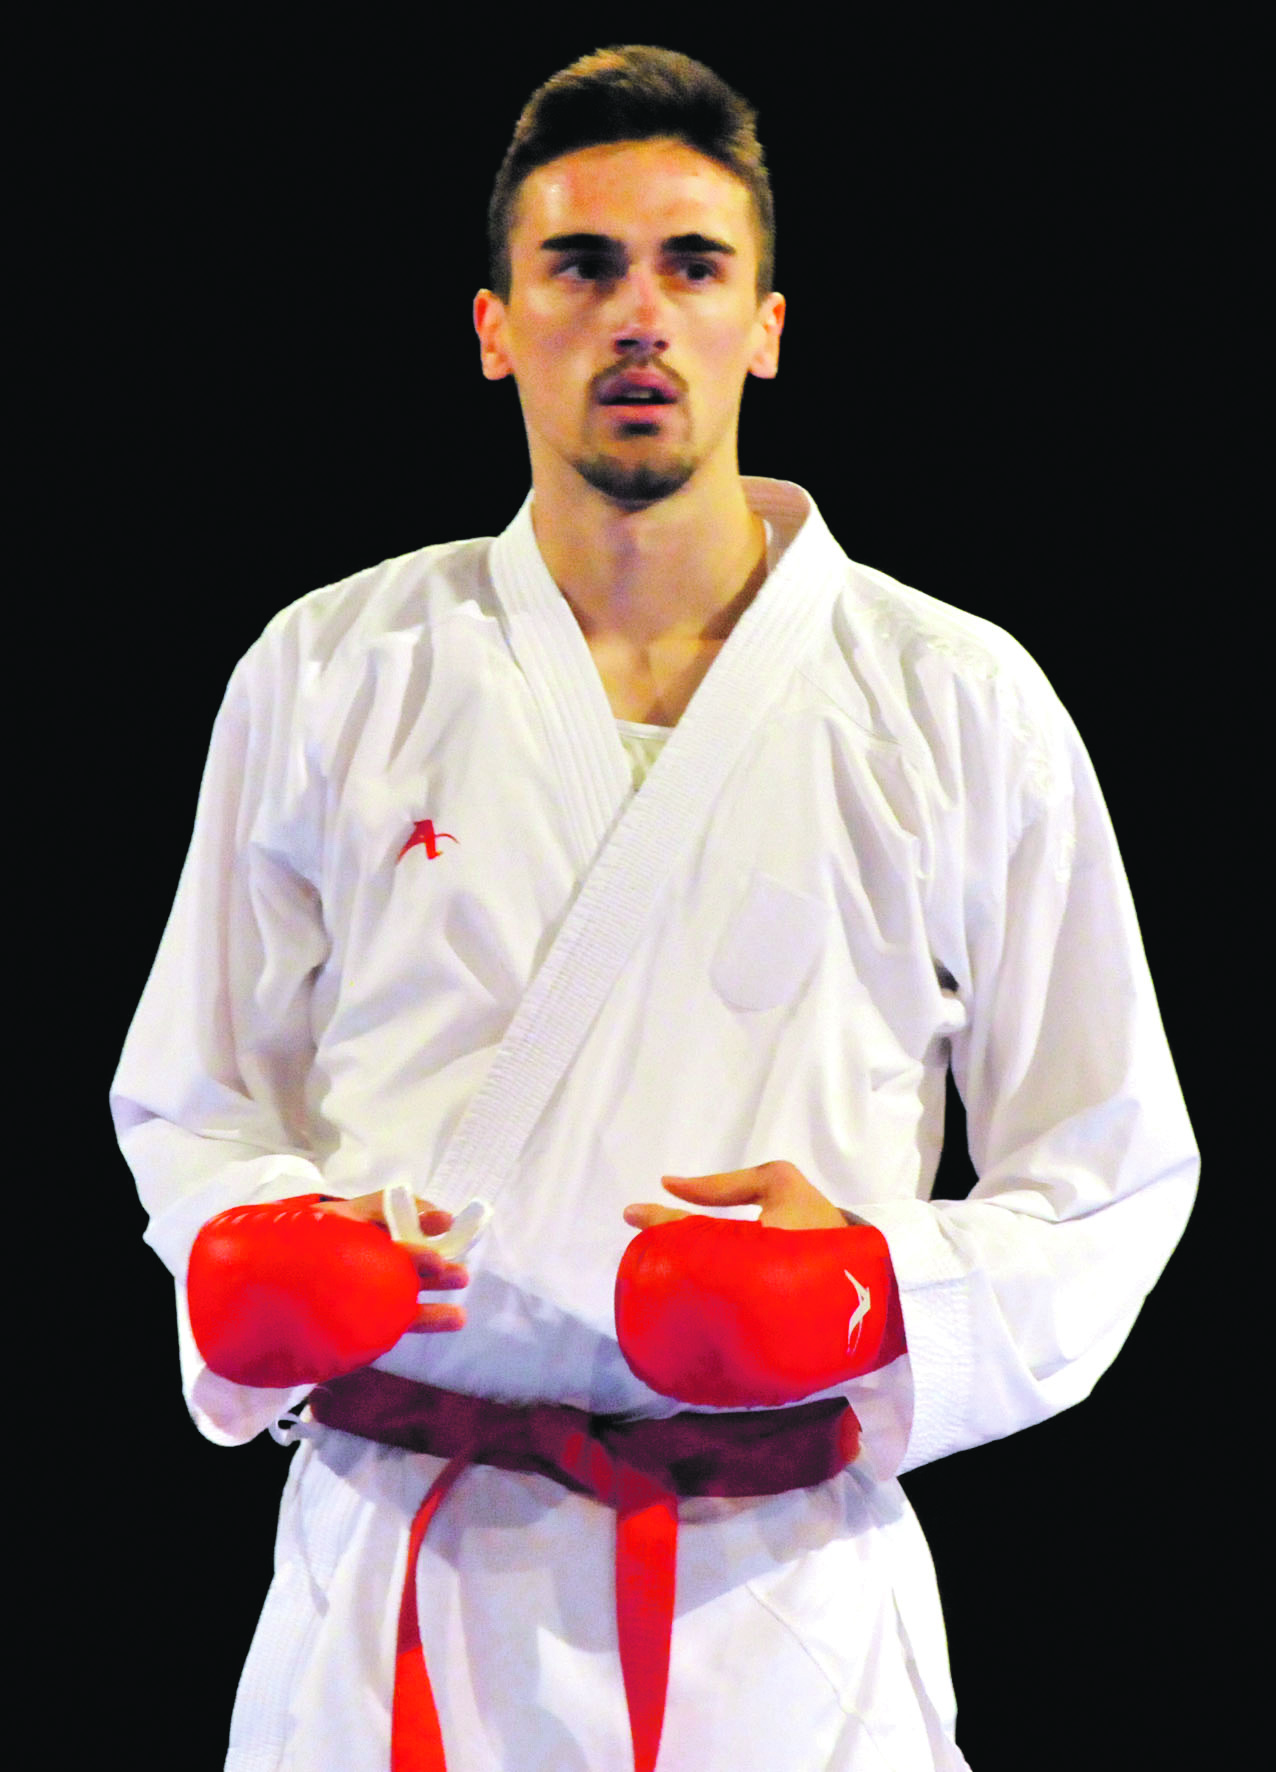 Siroki Brijeg, 26.11.2017. Karate turnir 7. Hercegovina Open Hrvatski reprezentativac Ivan Kvesic Snimio: Miljenko Karacic